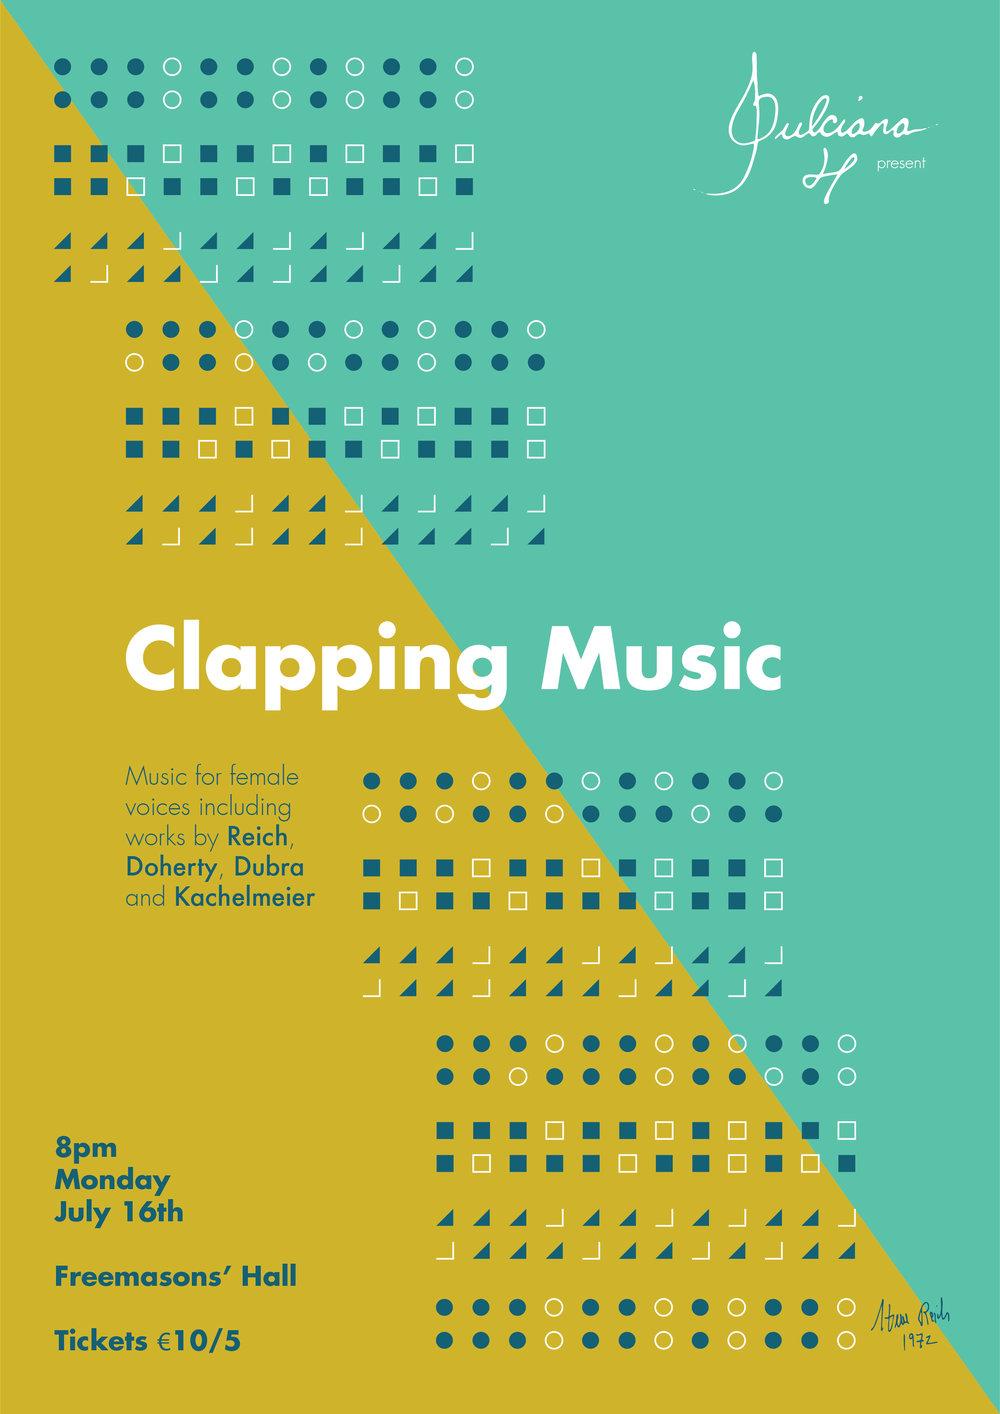 Dulciana_clapping_a4-03.jpg